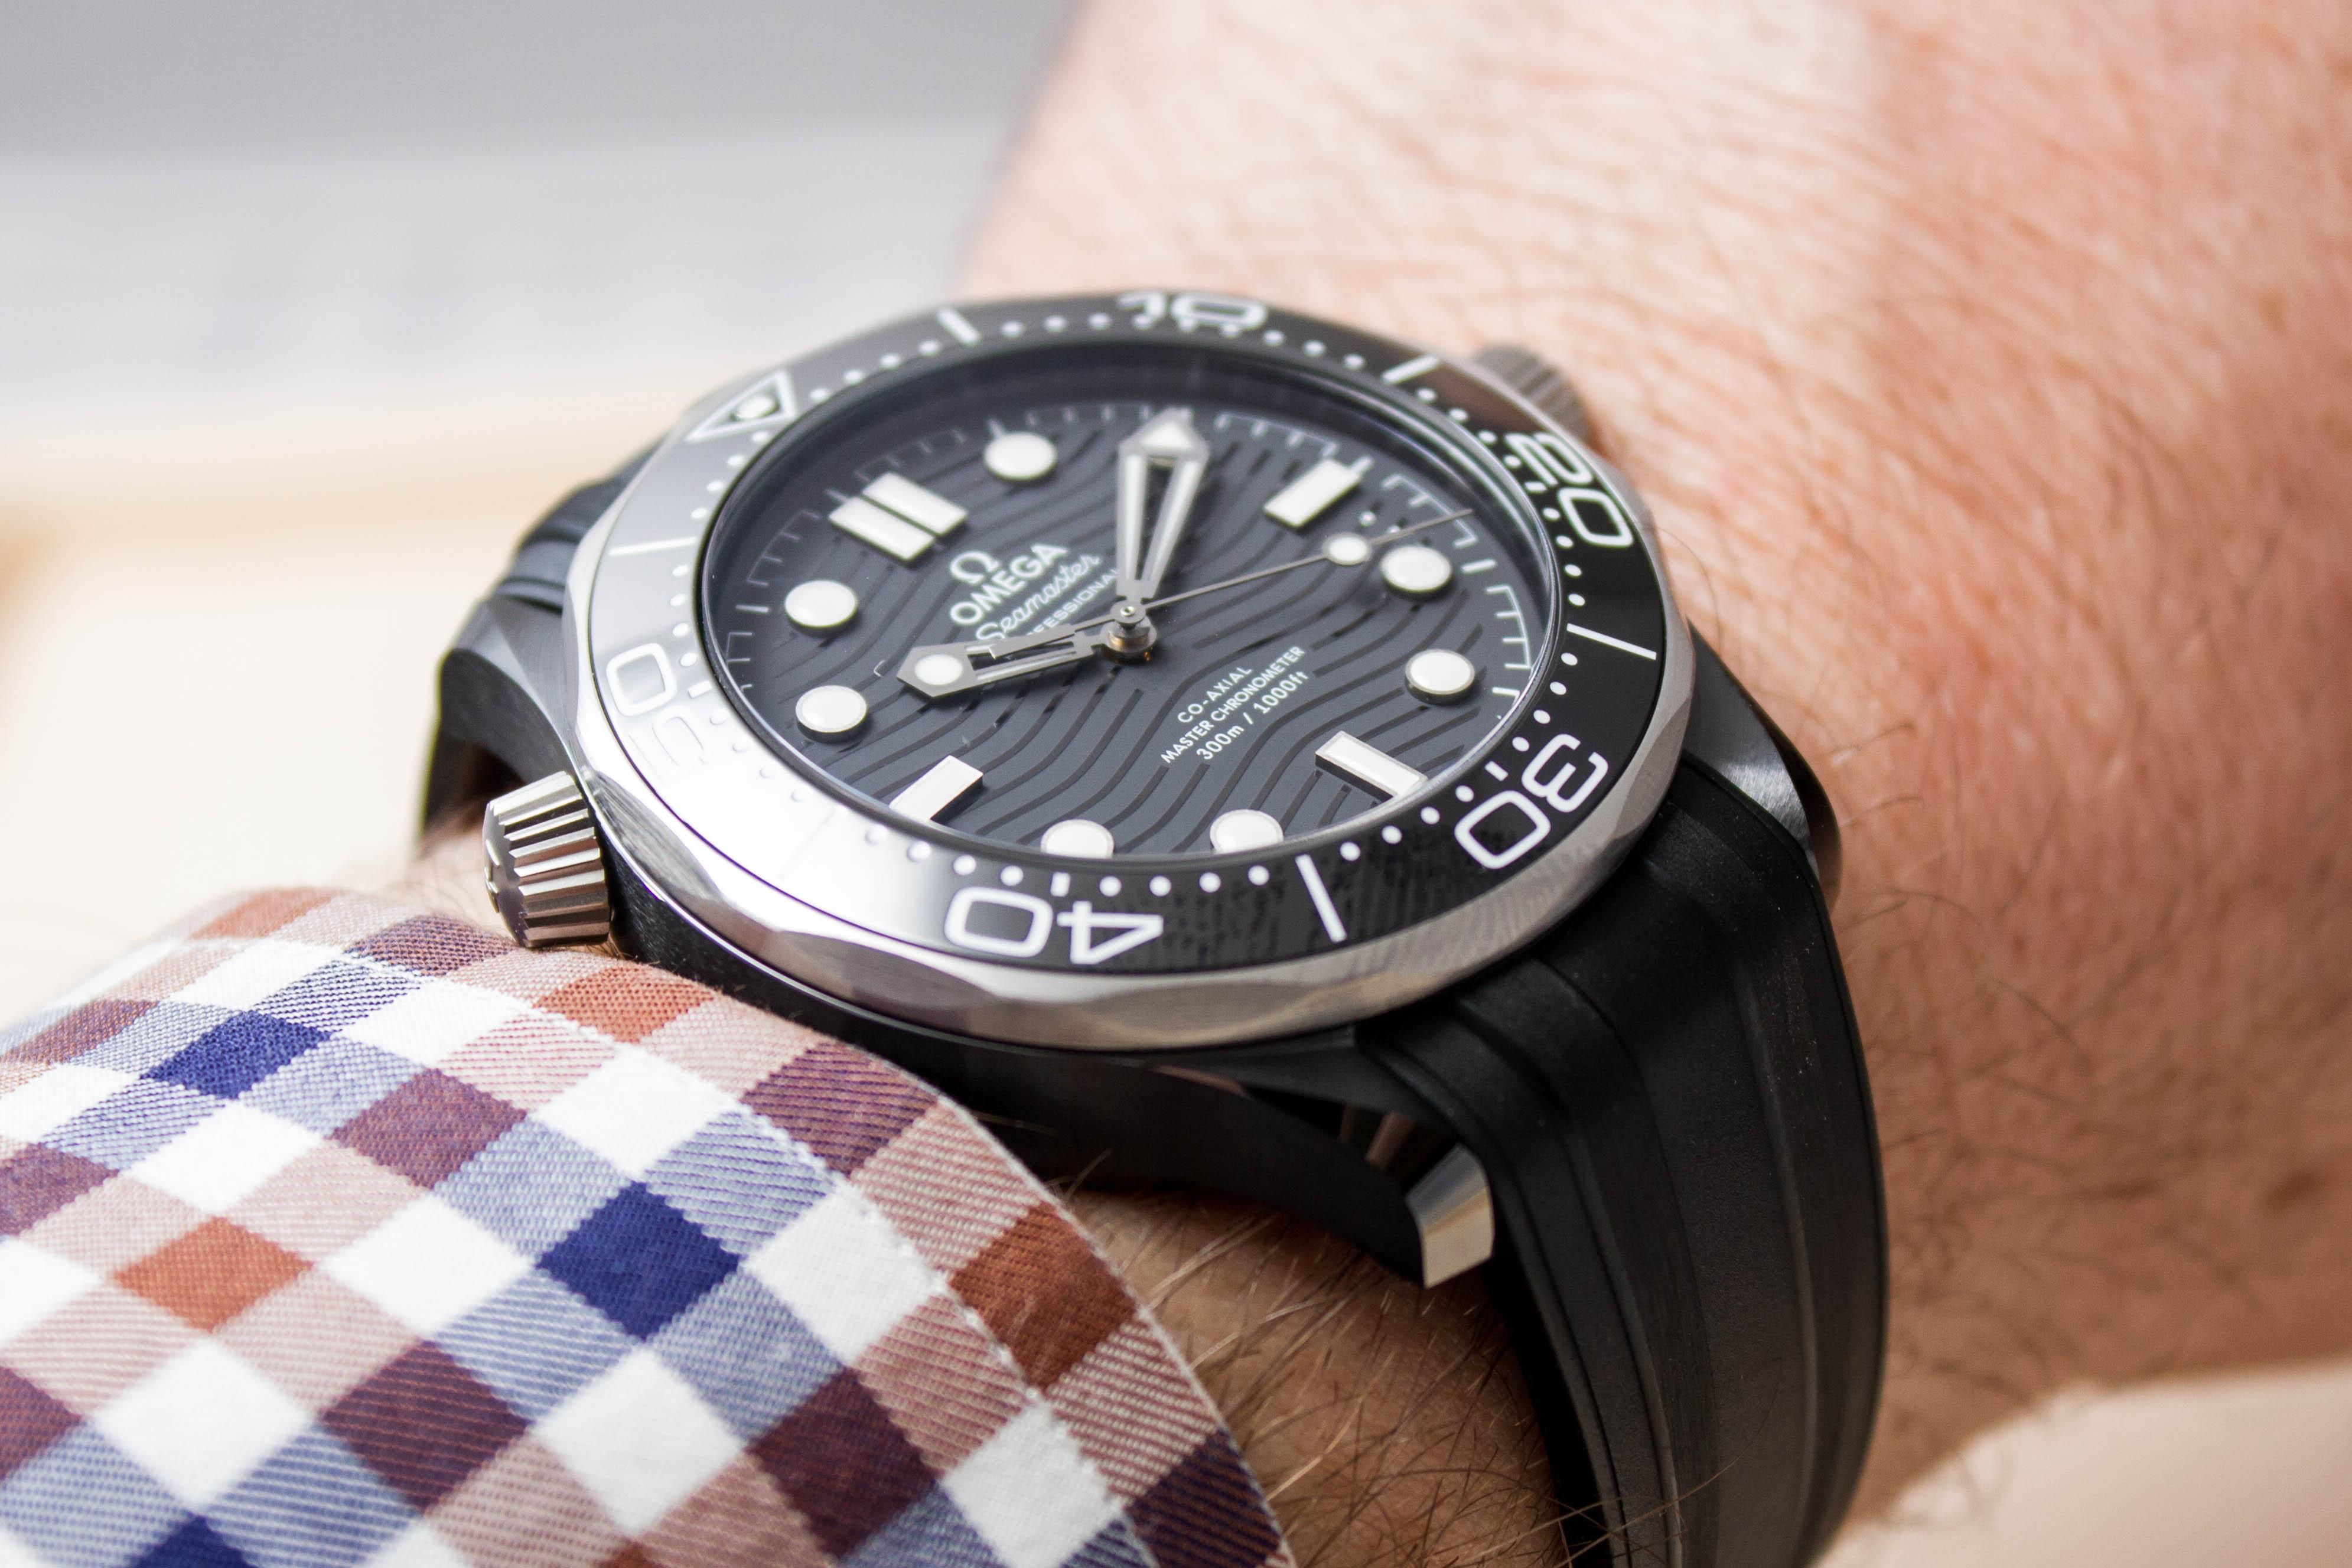 57cd59111ee4 Omega Seamaster Diver 300M Ceramic-and-Titanium no-date –  210.92.44.20.01.001 – review – 10